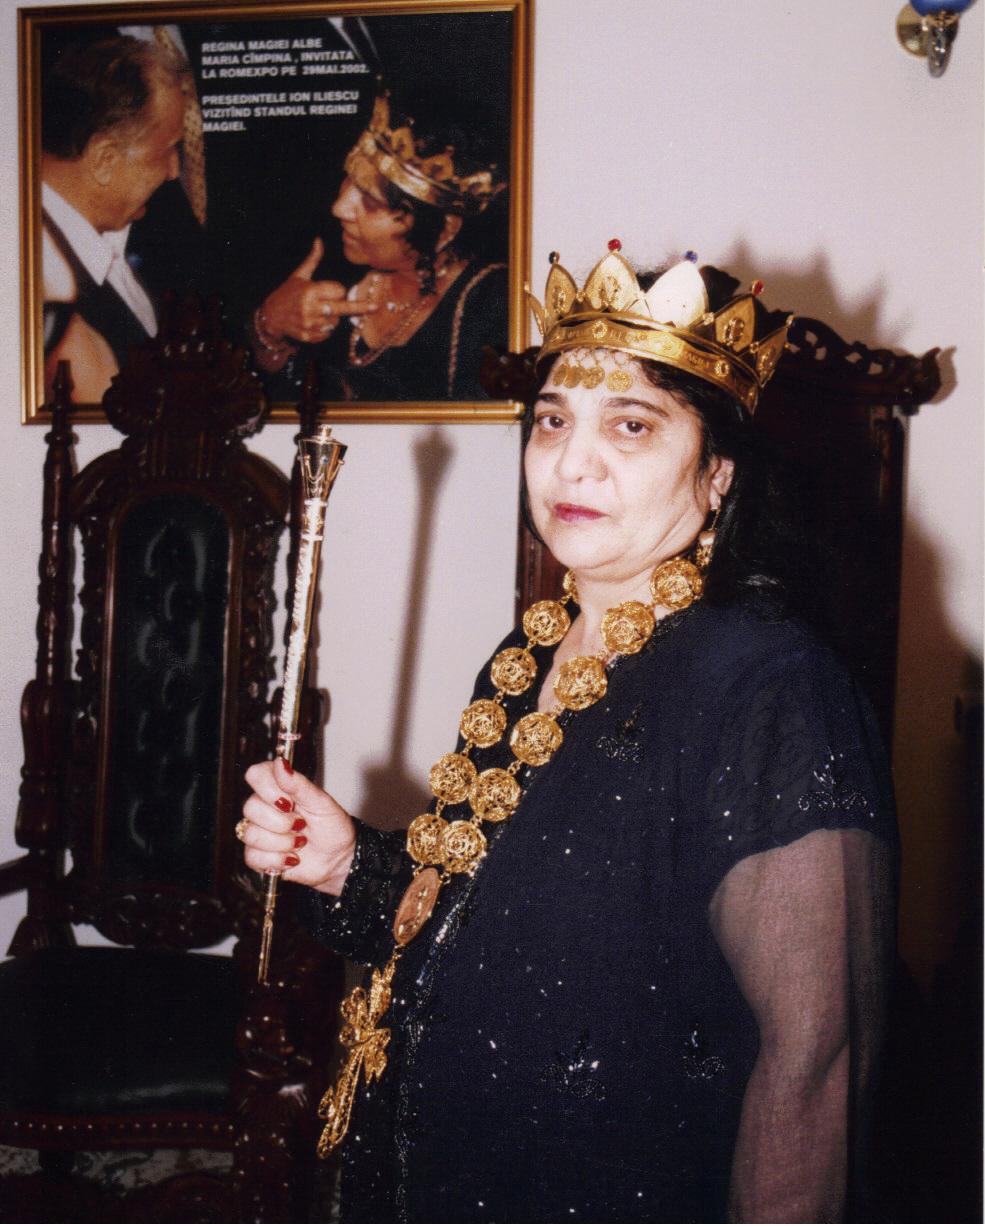 Mulţumiri recente din America pentru Regina Magiei Albe din România, Maria Câmpina